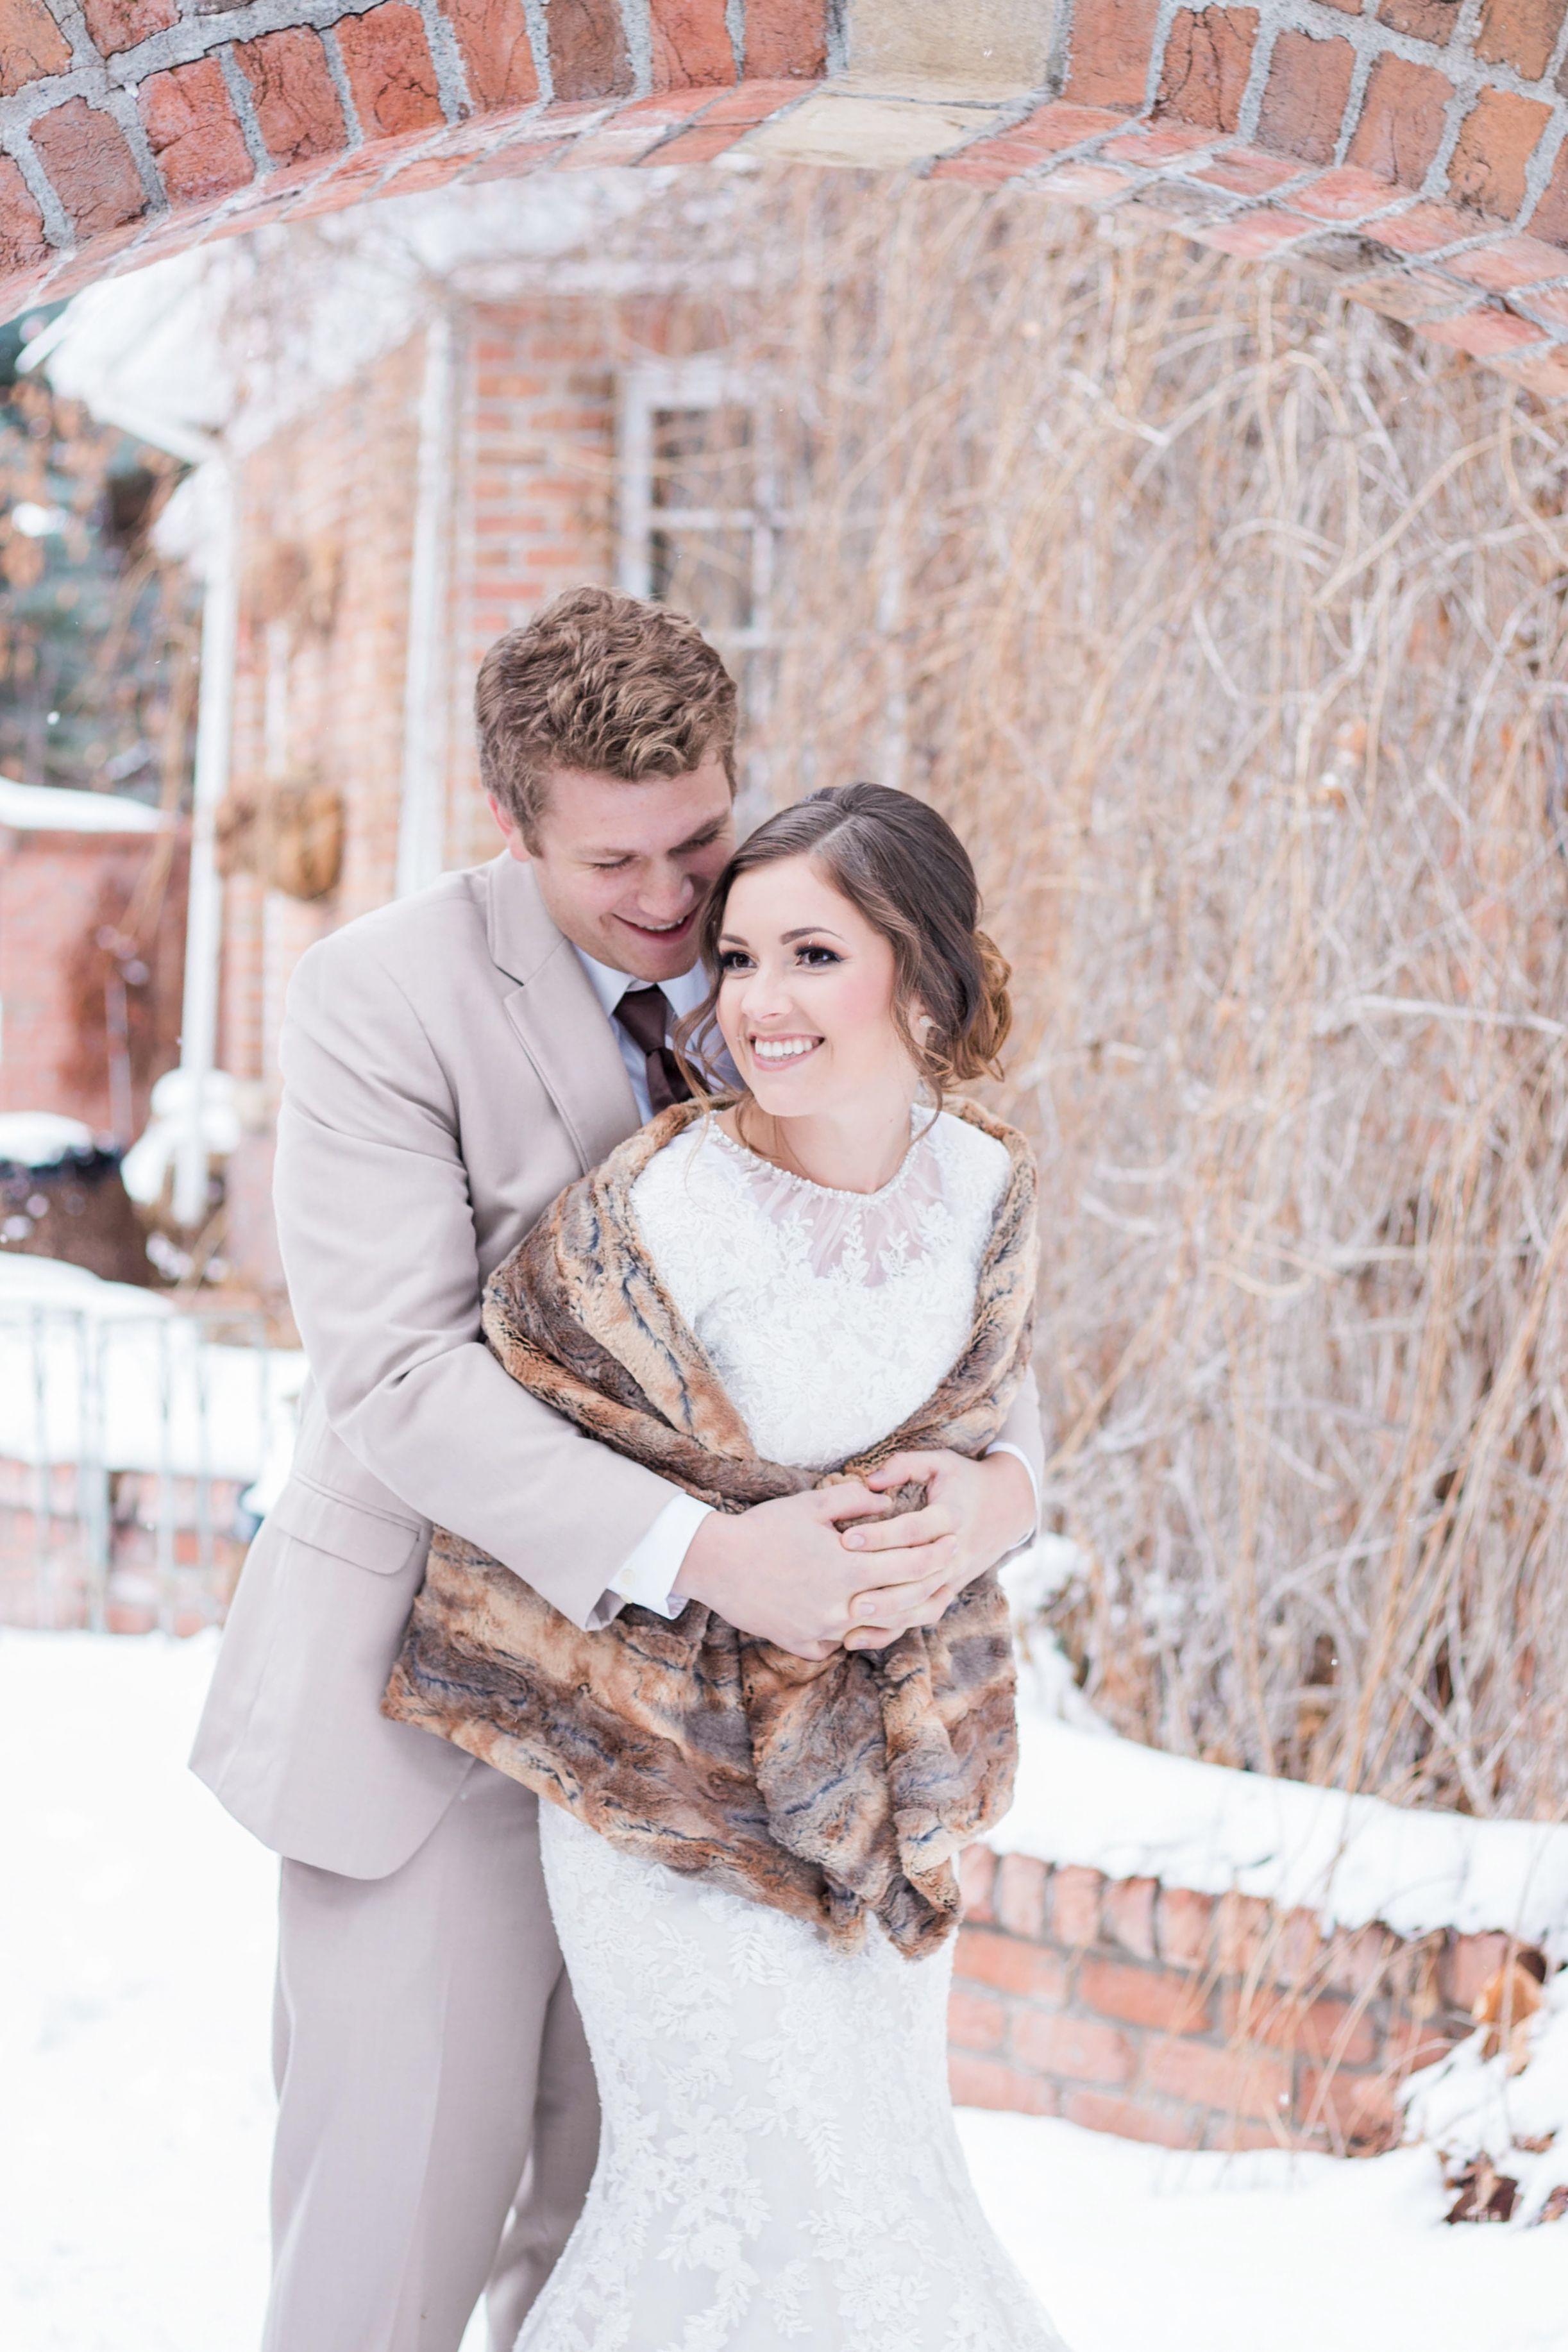 405fab10a46 Winter Wedding Wonderland - Pittsburgh Wedding - Blue Winter Wedding - Fur  Wrap wedding dress